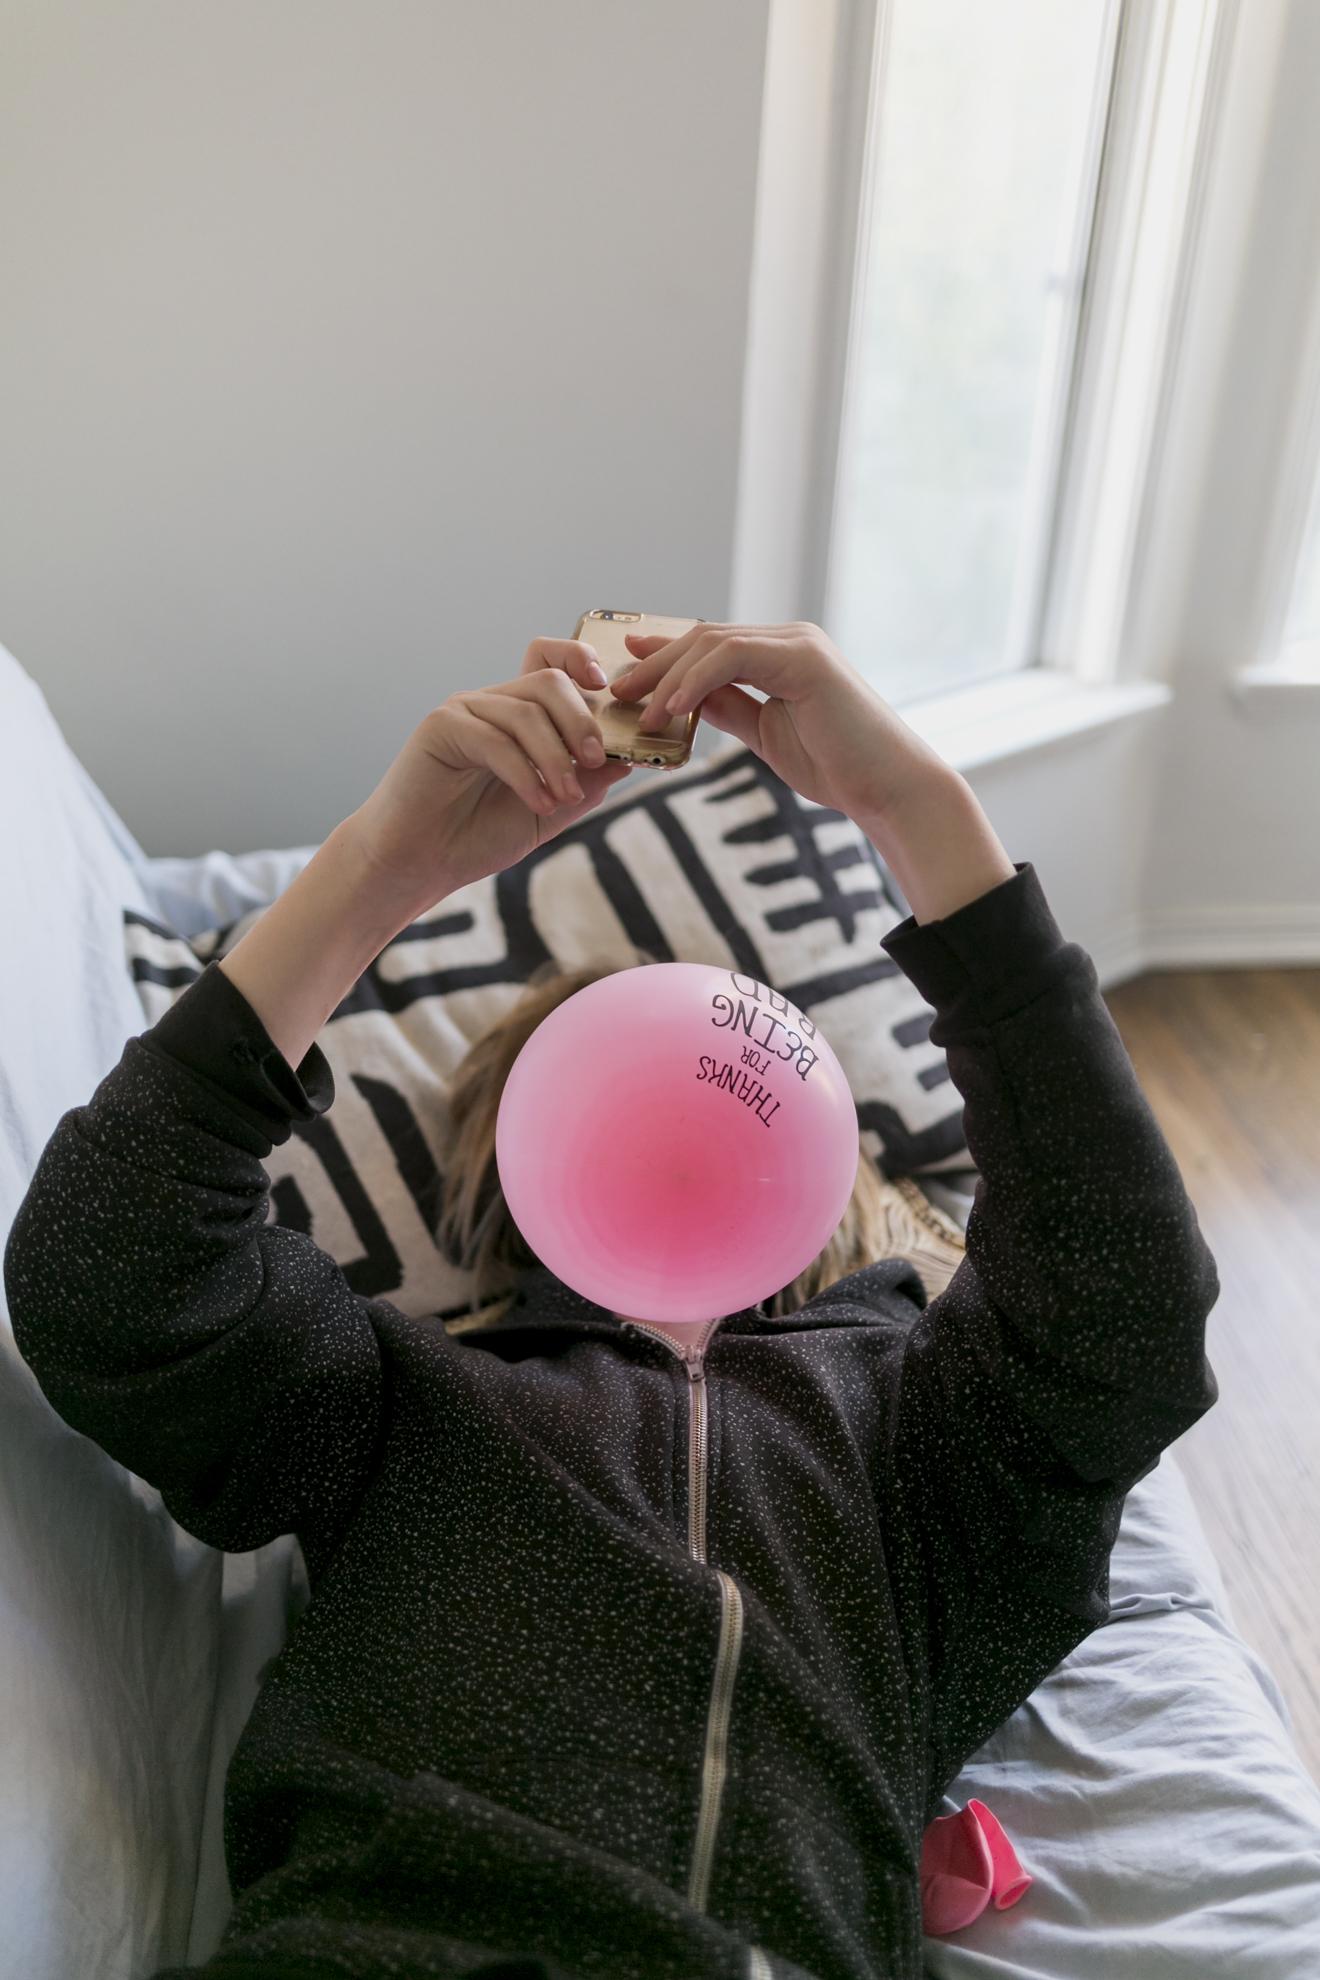 aly_Balloon_Z7C2264.jpg